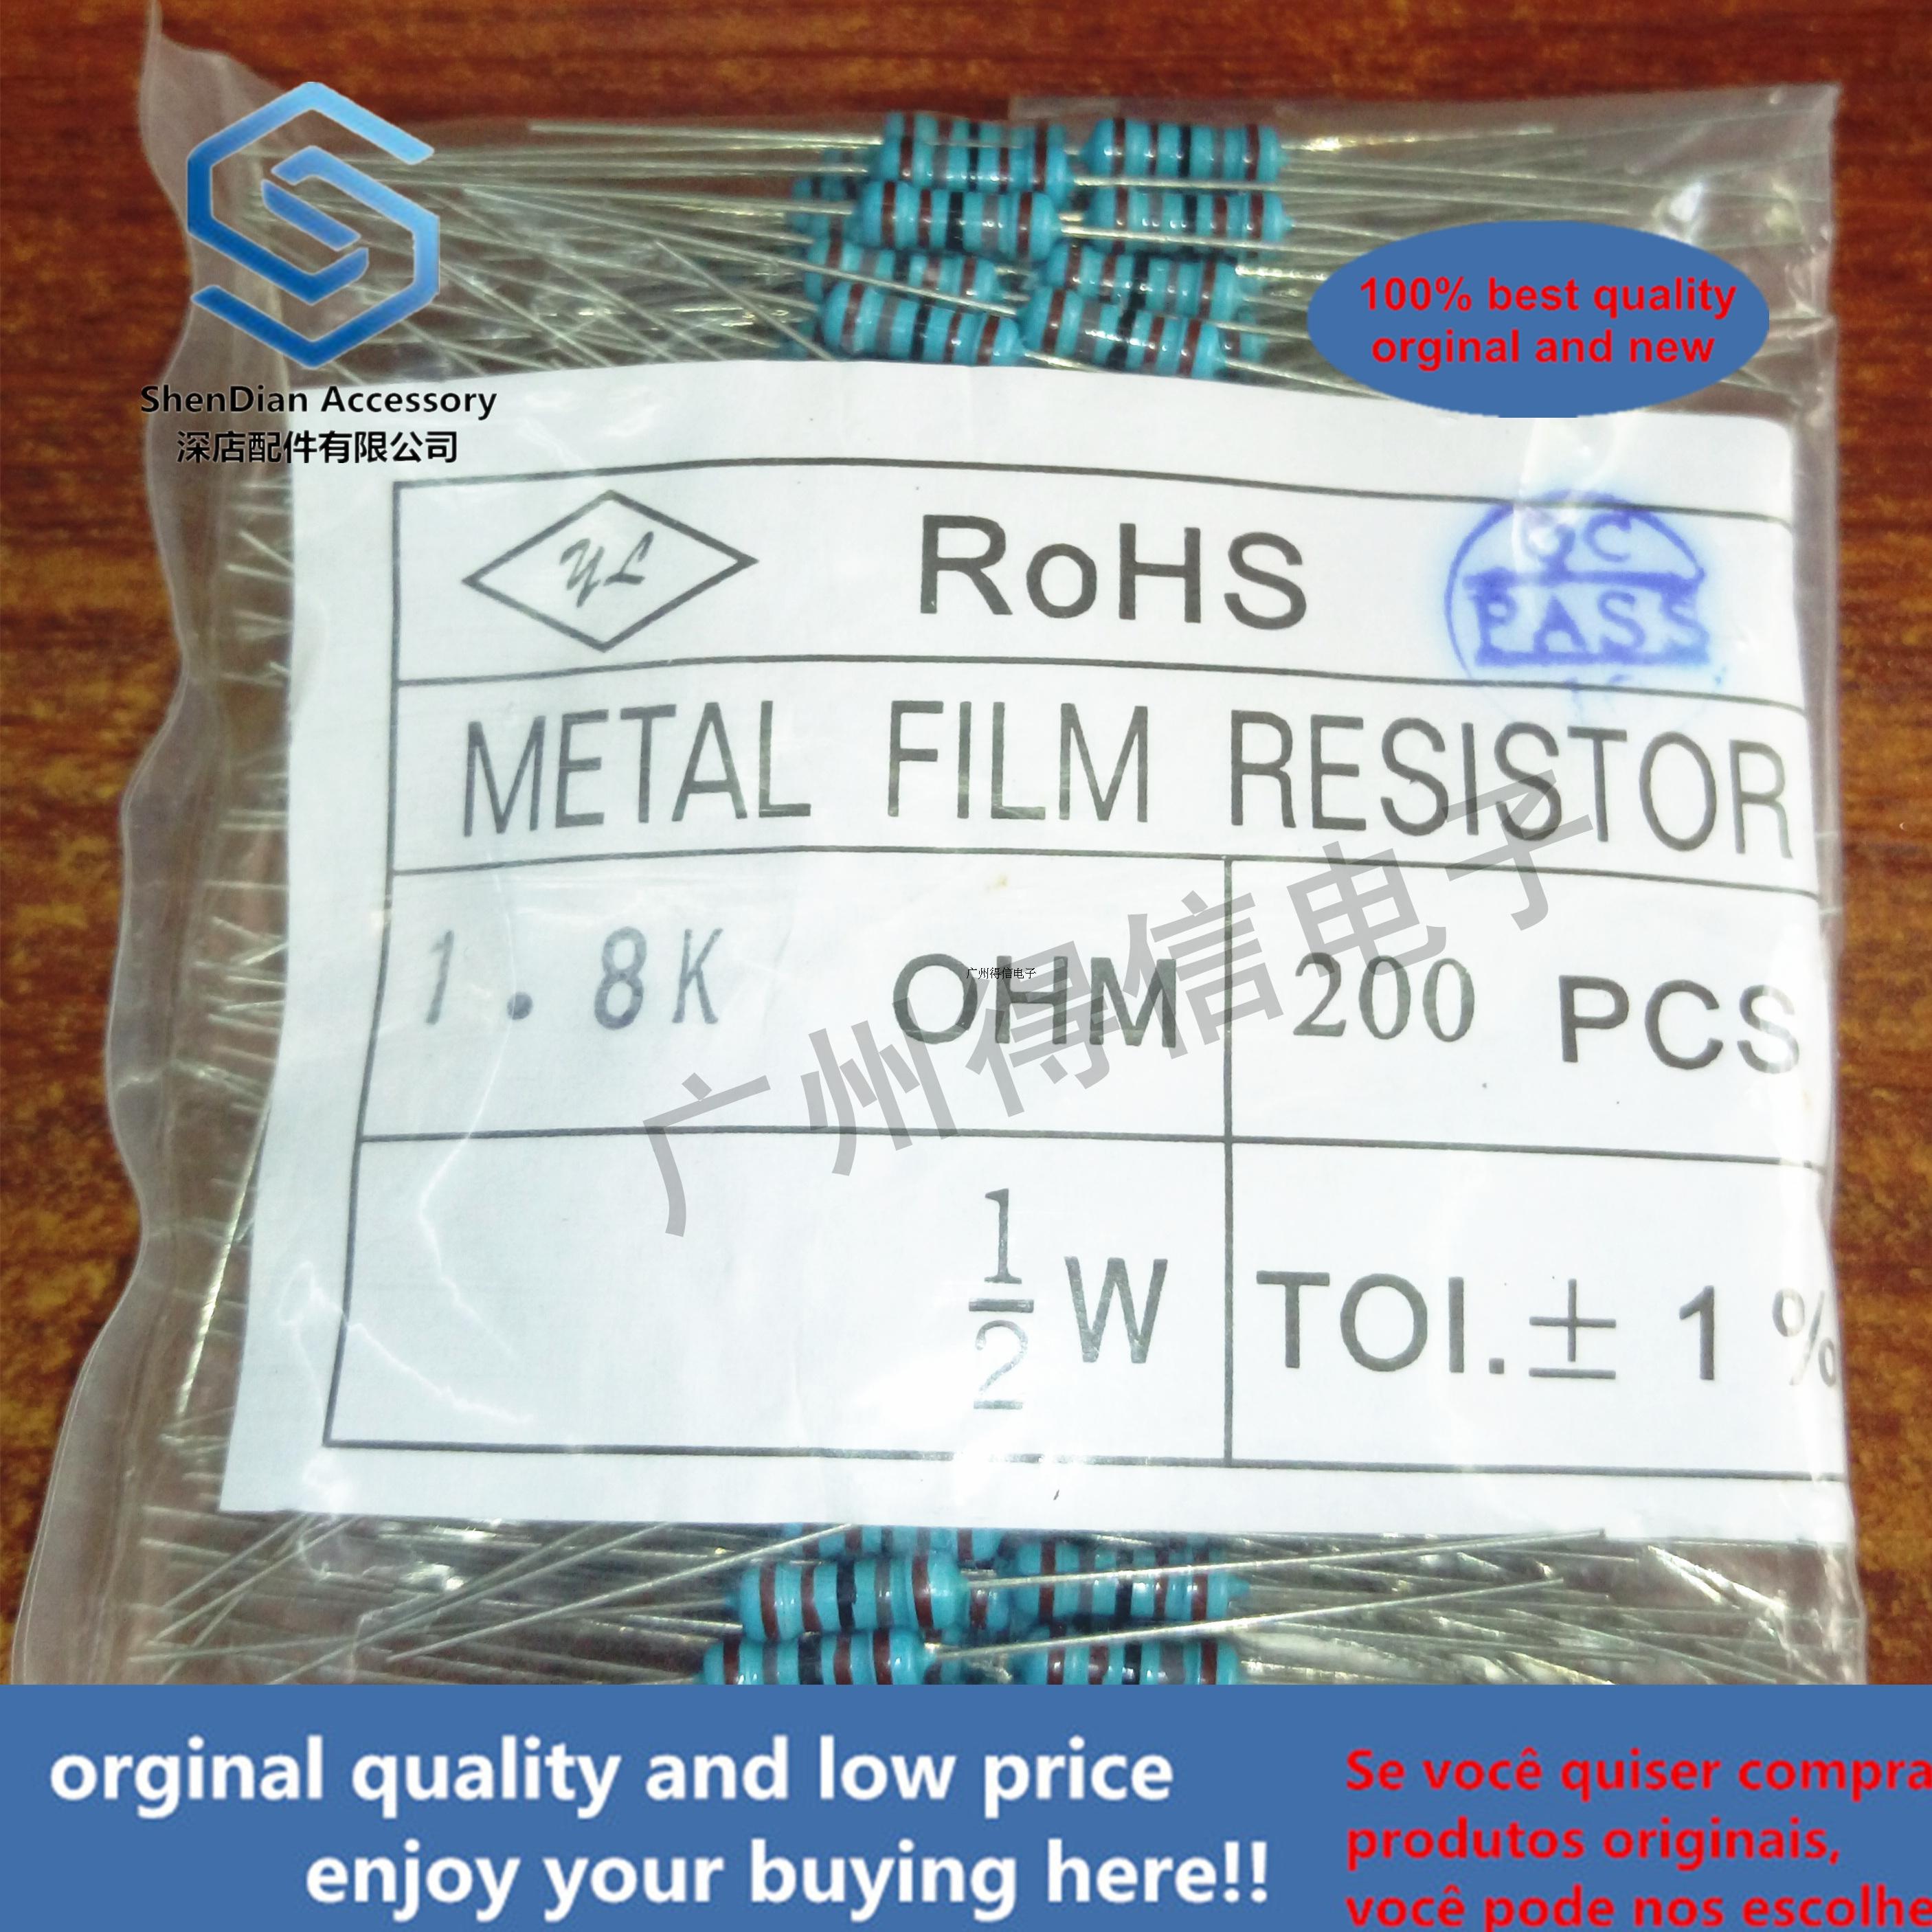 200pcs 1 / 2W 390K 1% Brand New Metal Film Iron Feet Resistance Bag 200 Pcs Per Pack